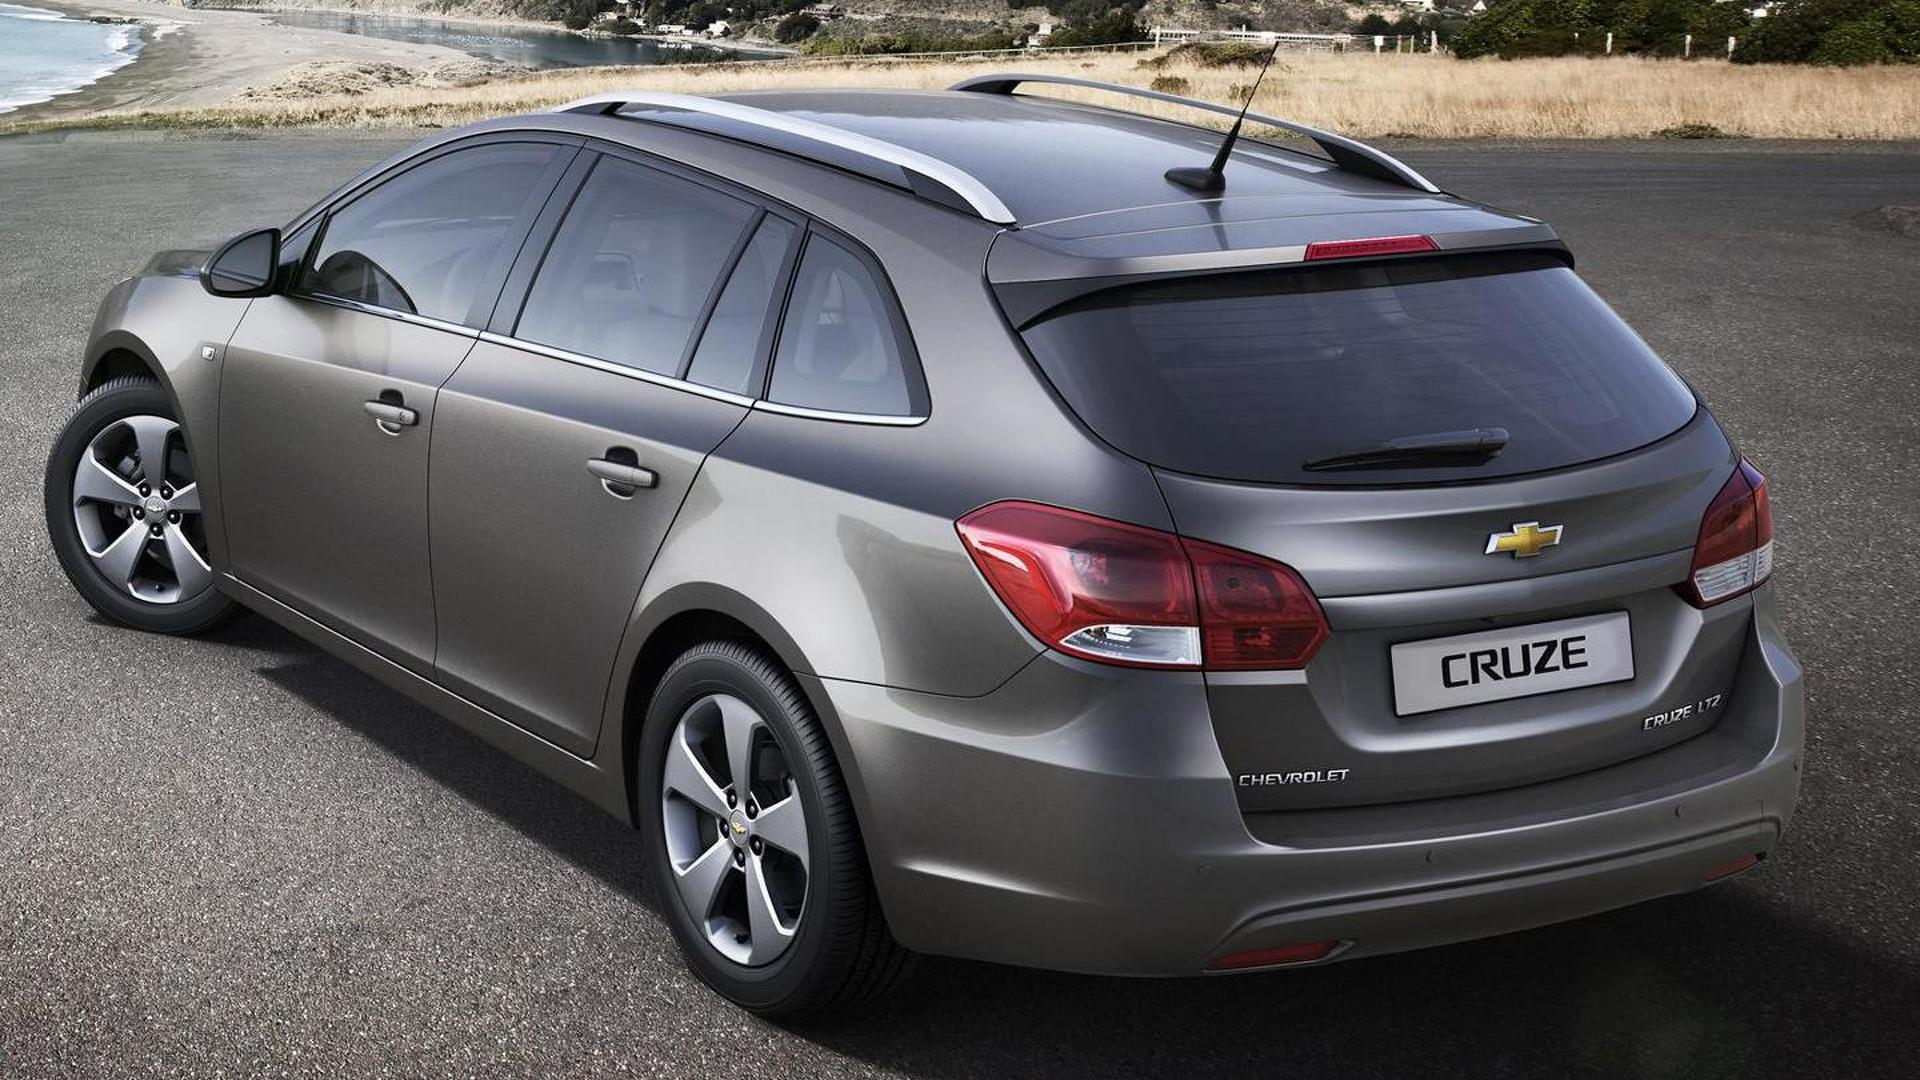 Chevrolet Cruze Wagon previewed ahead of Geneva debut